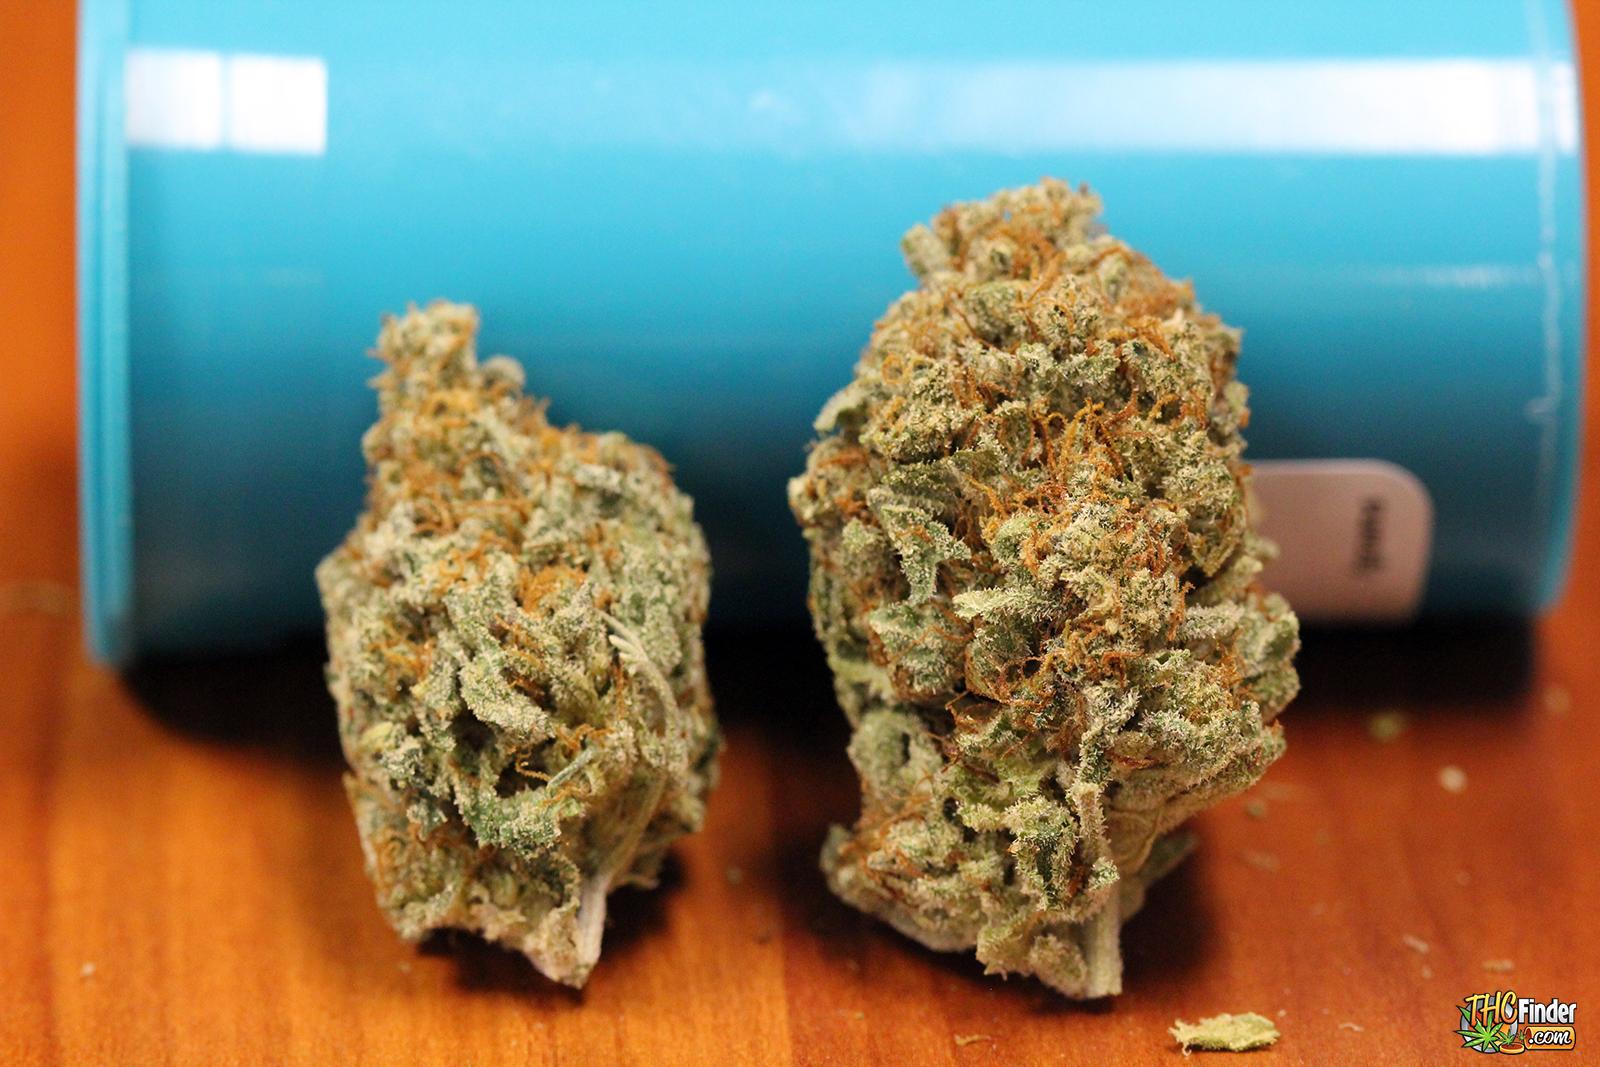 nyc-diesel-cannabis